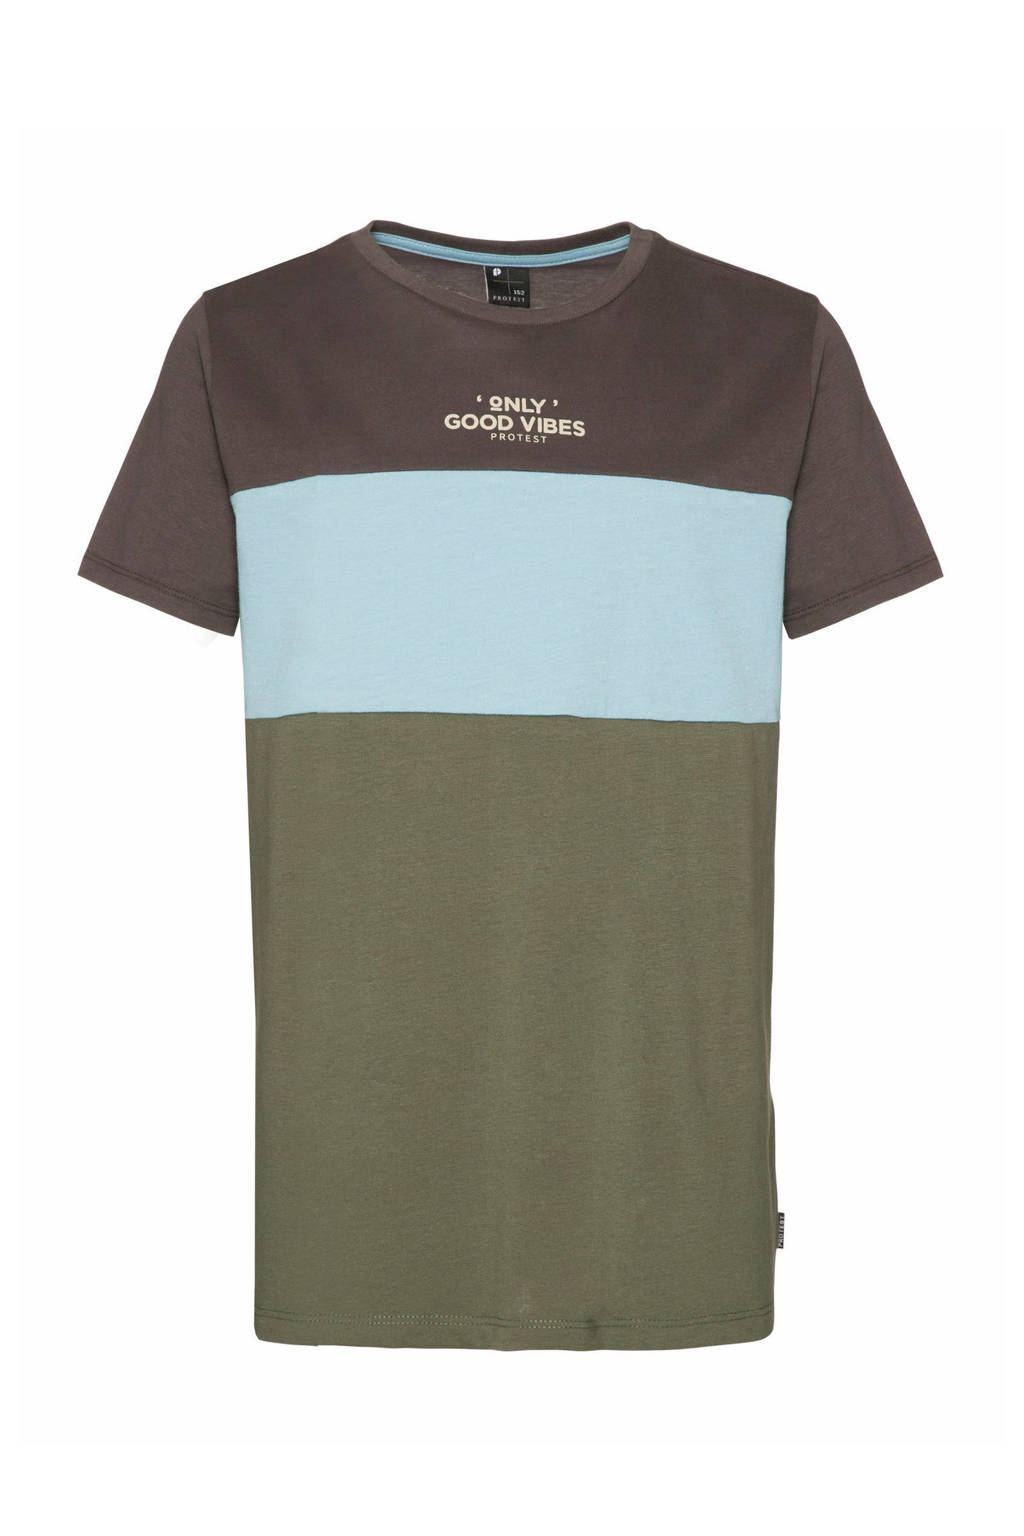 Protest T-shirt Nino donkergrijs/blauw/groen